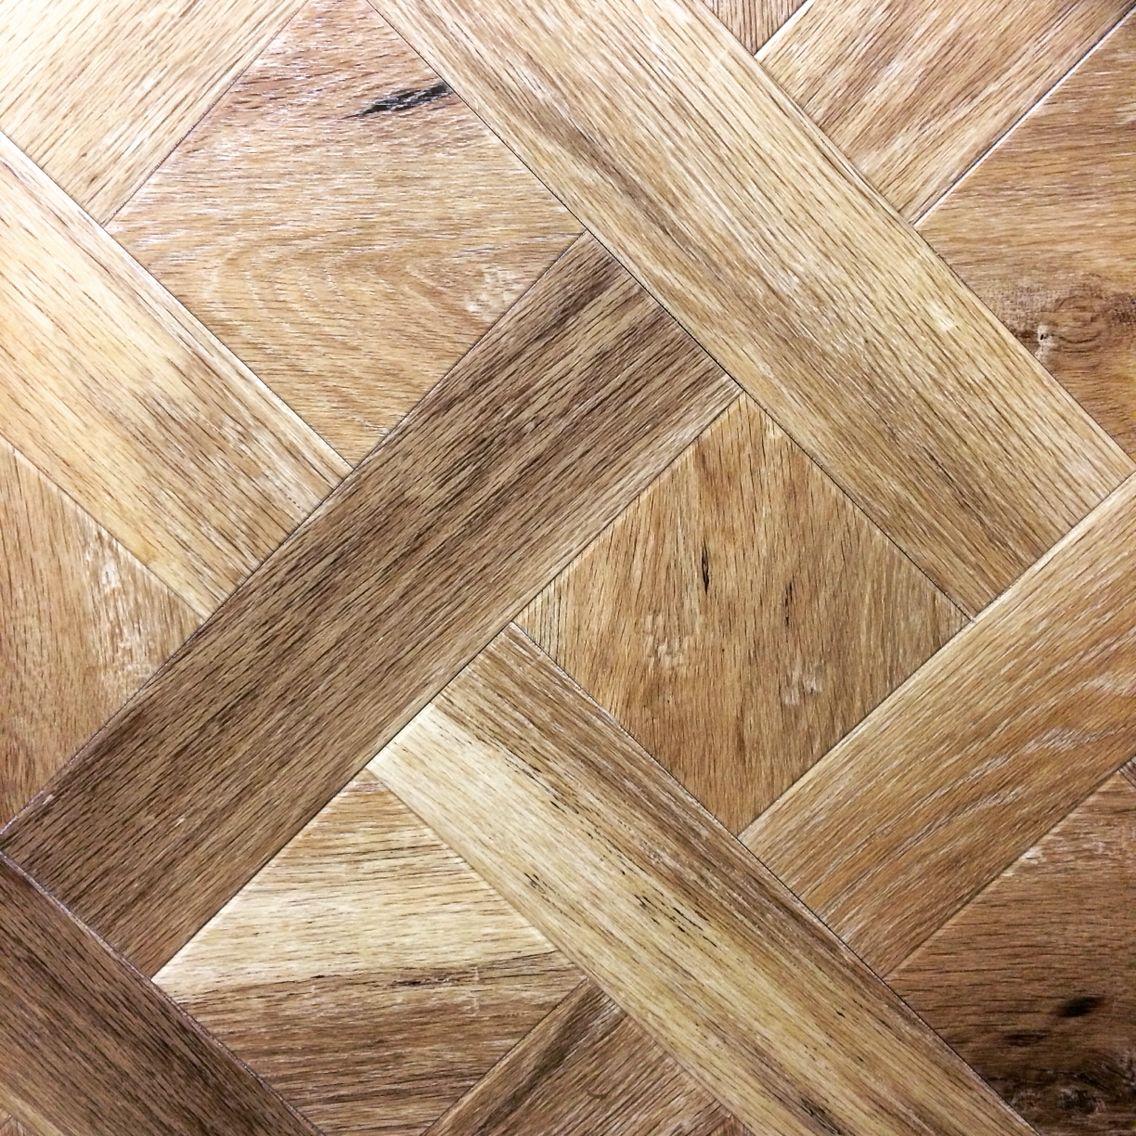 Vinyl Real Wood Flooring: Amtico Worn Oak AROW7390 Basket Weave Design